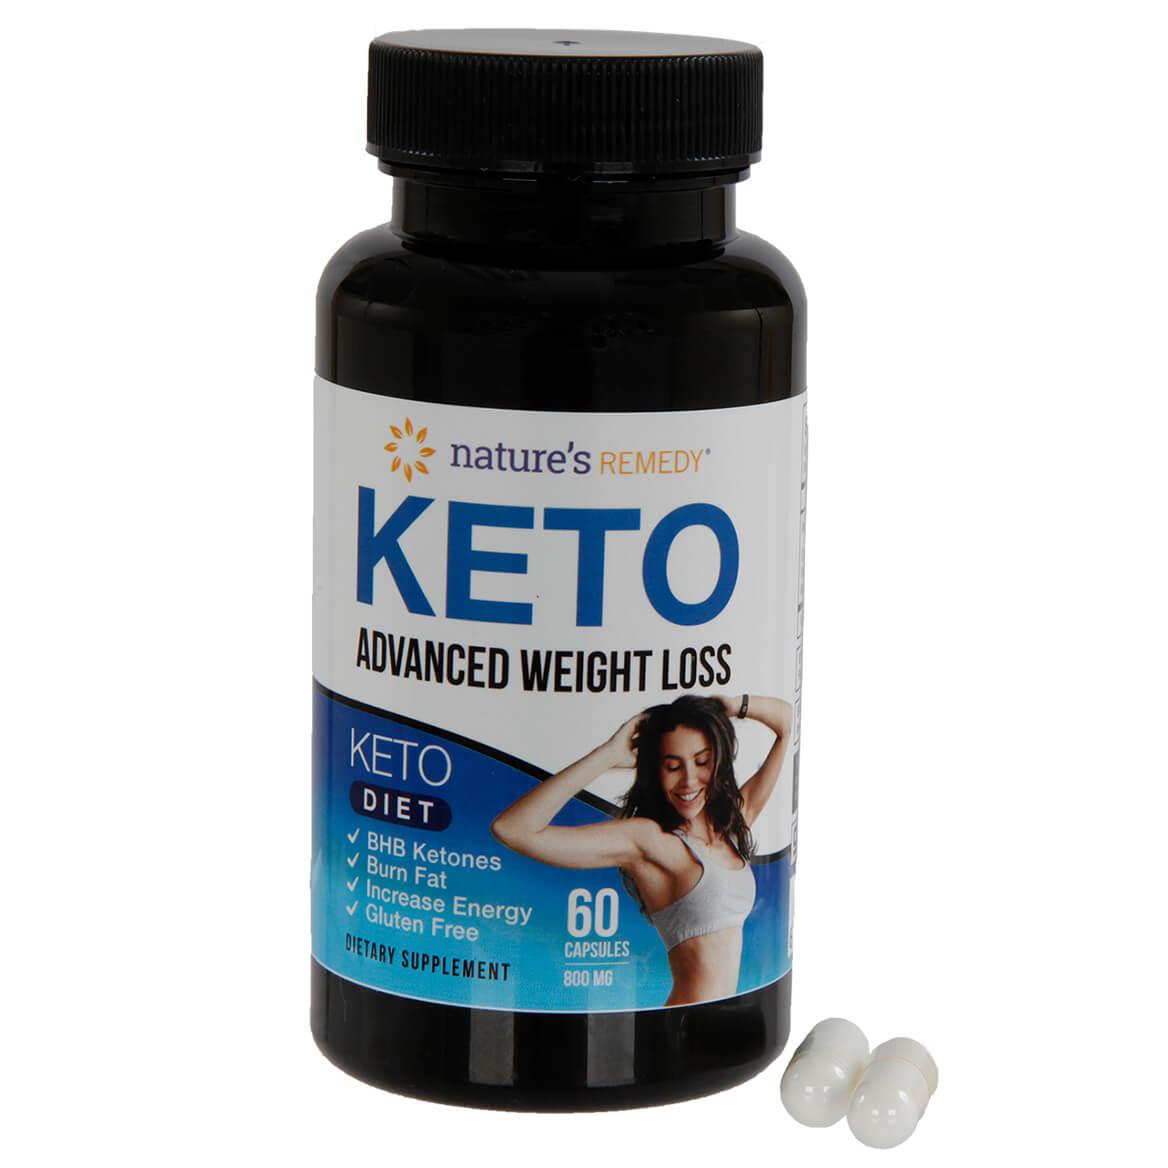 Keto Advanced Weight Loss Supplement-369732